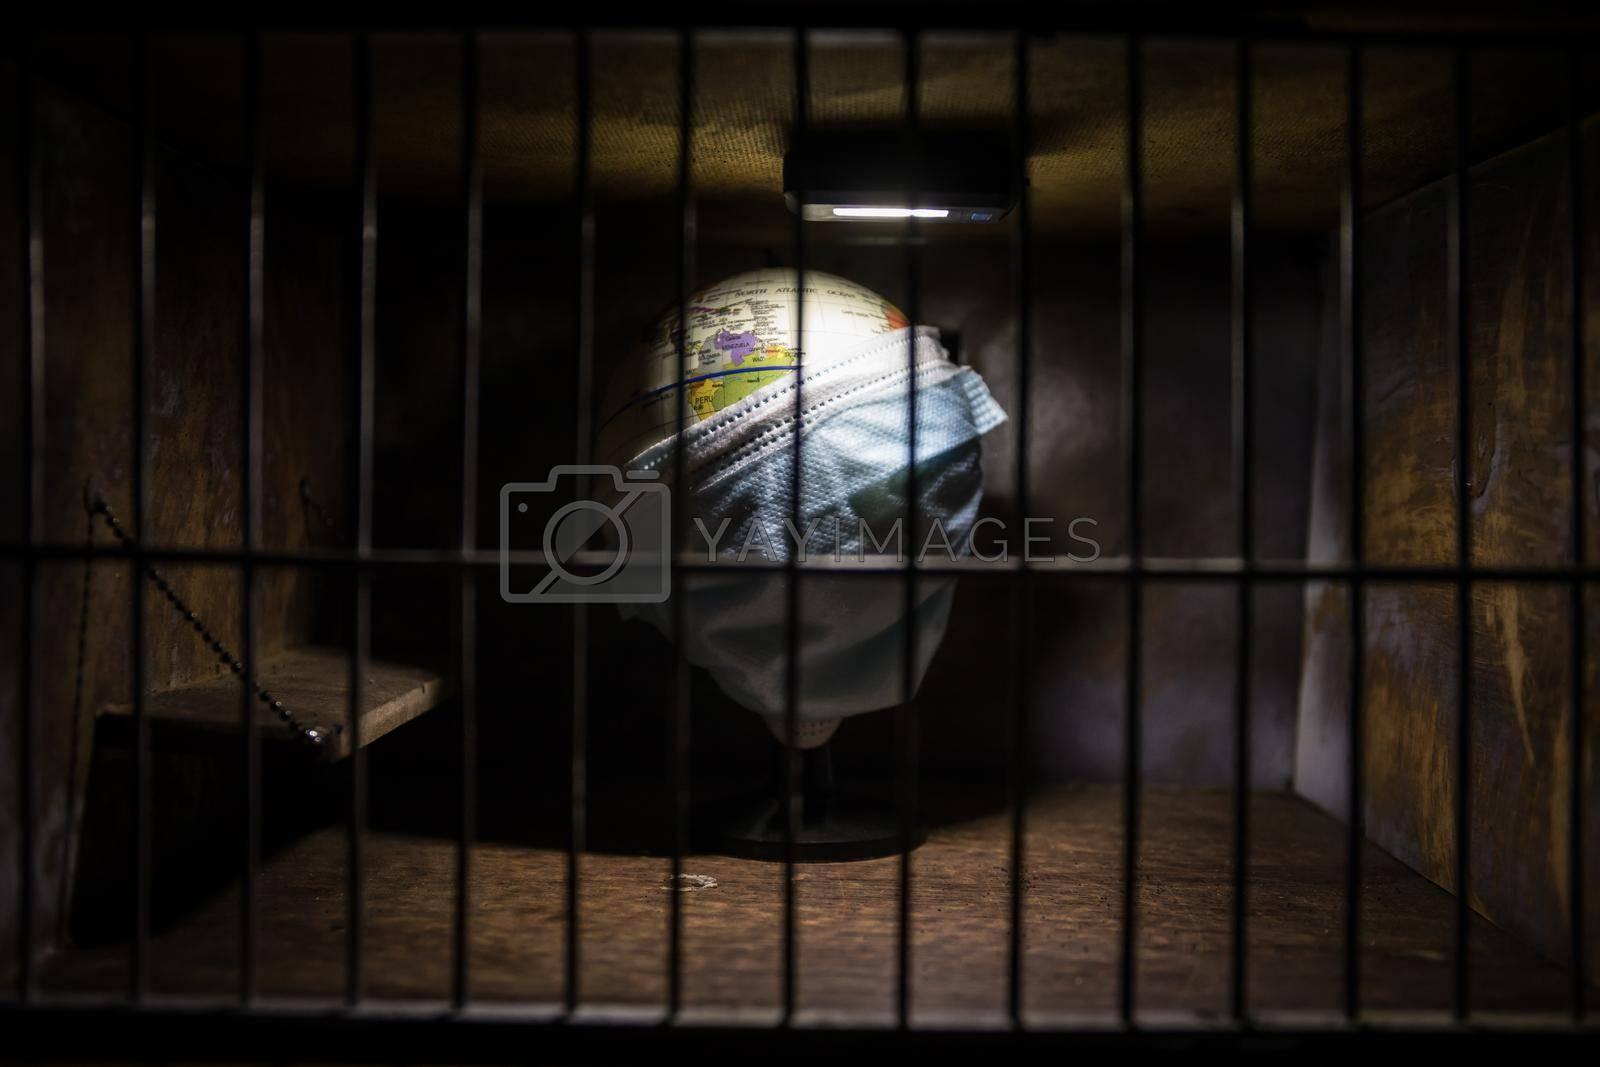 Corona virus lockdown creative concept. Planet earth trapped inside old prison. Creative artwork decoration. Selective focus